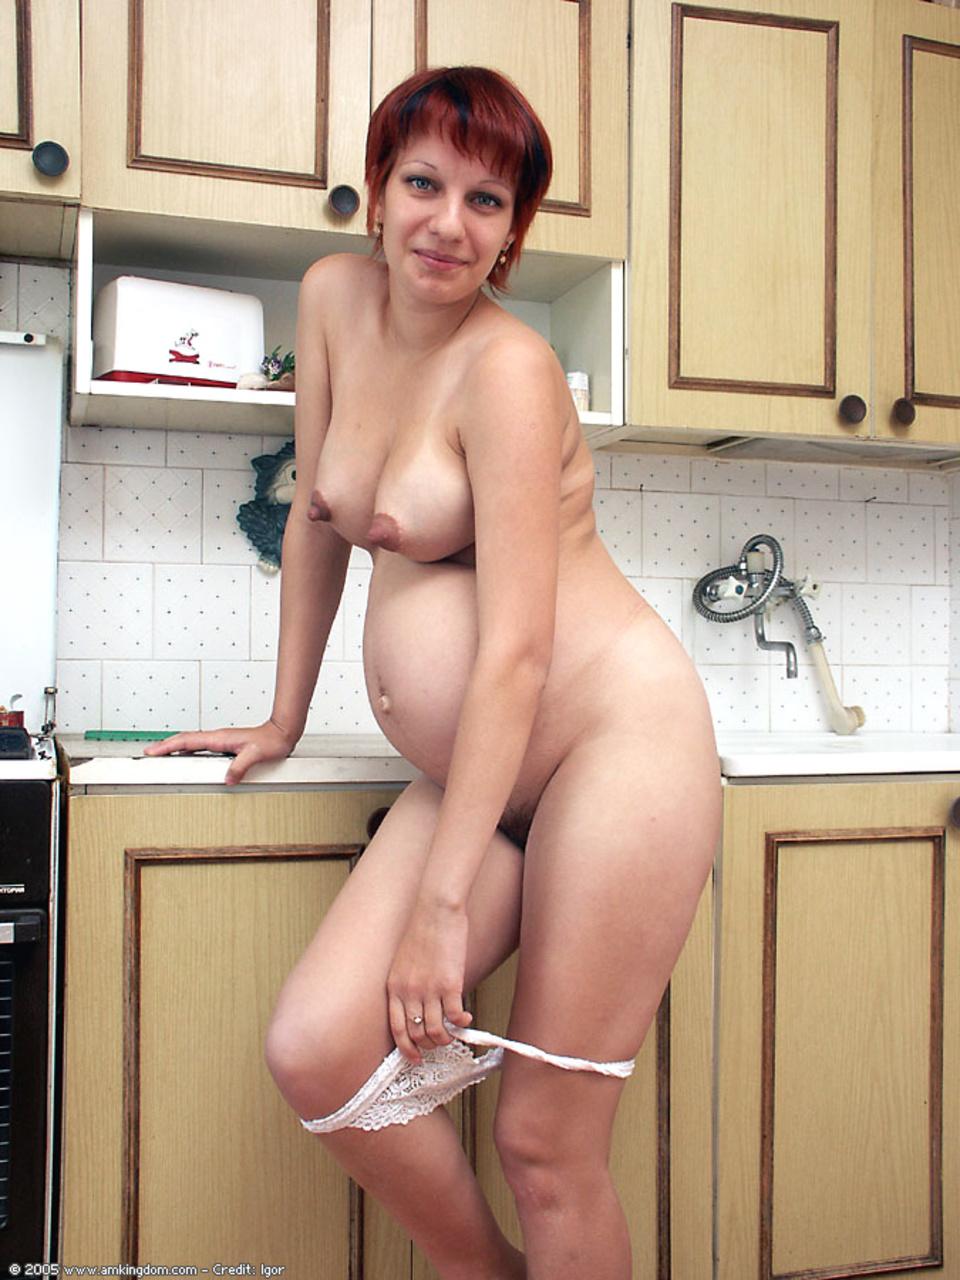 beremennaya-na-kuhne-porno